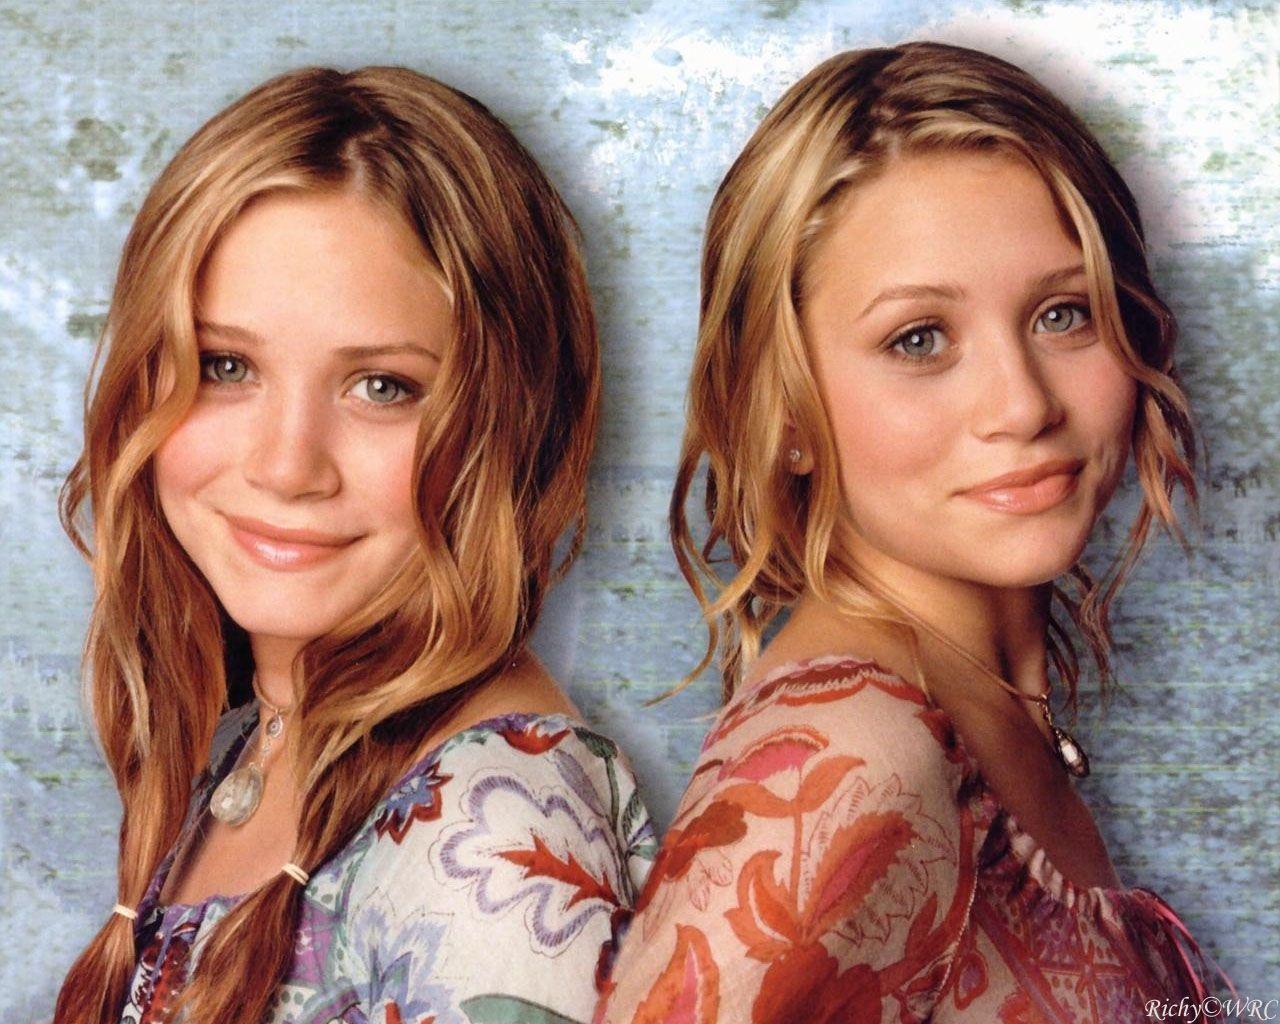 olson twins young young mary kate and ashley | توأم من أغنى المشاهير الشباب، يمتلكون .